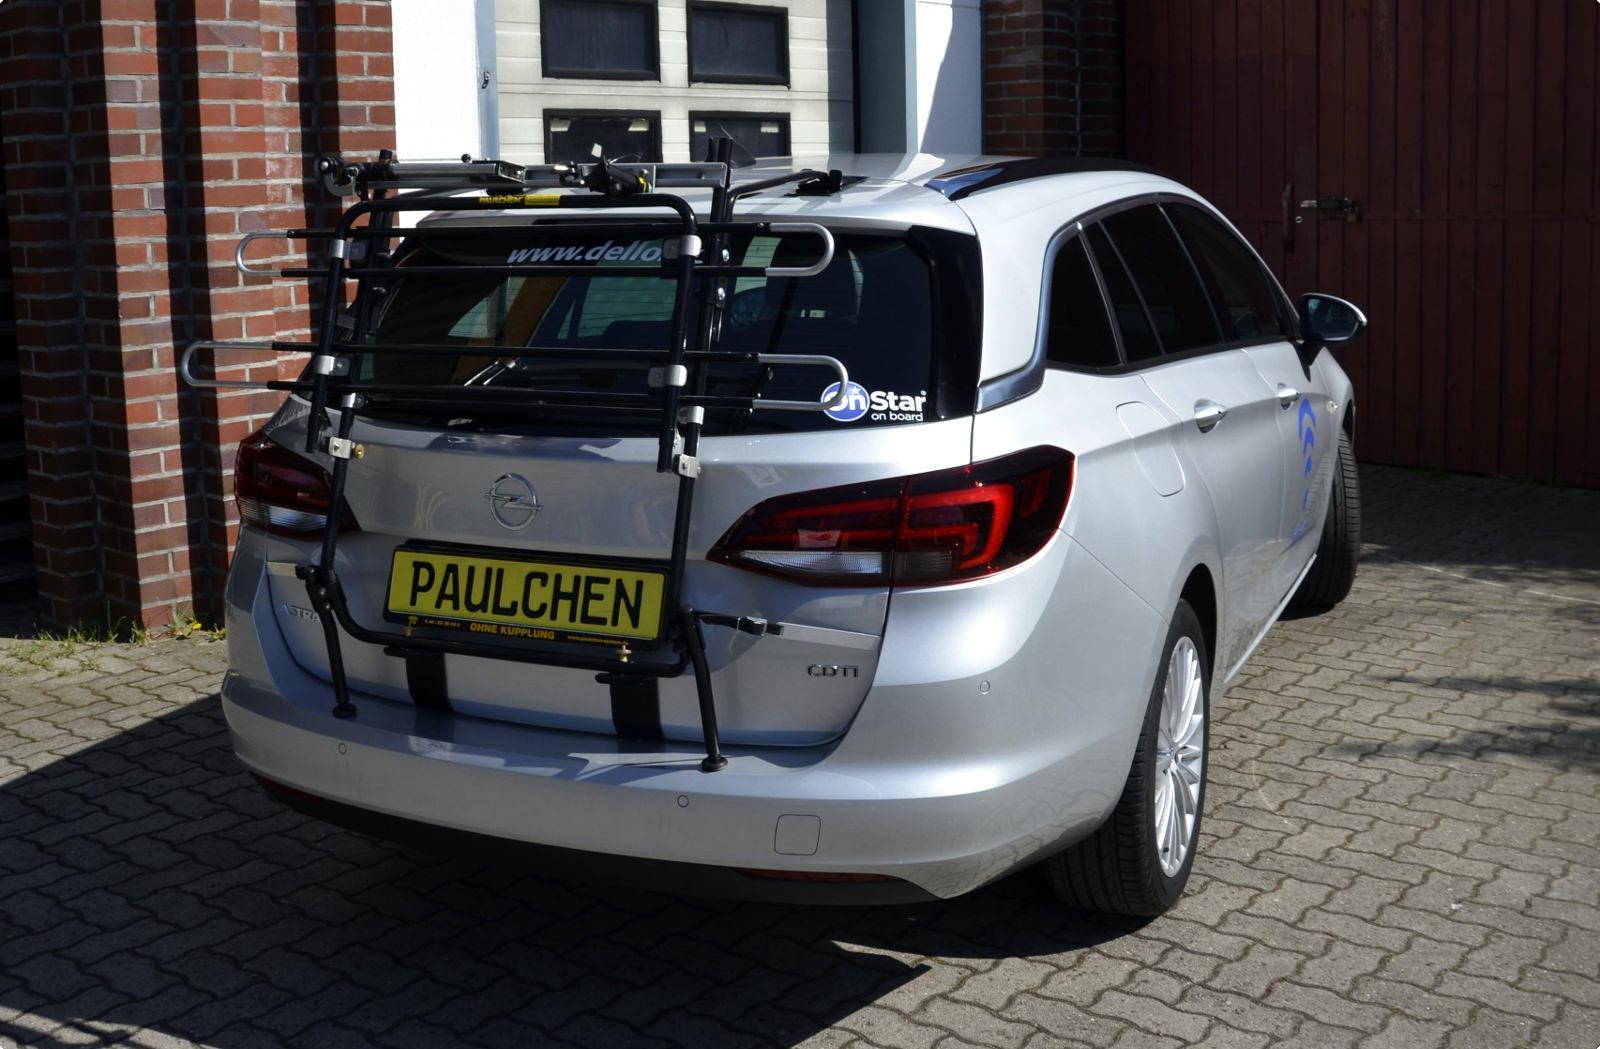 fahrradträger für opel astra k sports tourer - paulchen heckträger